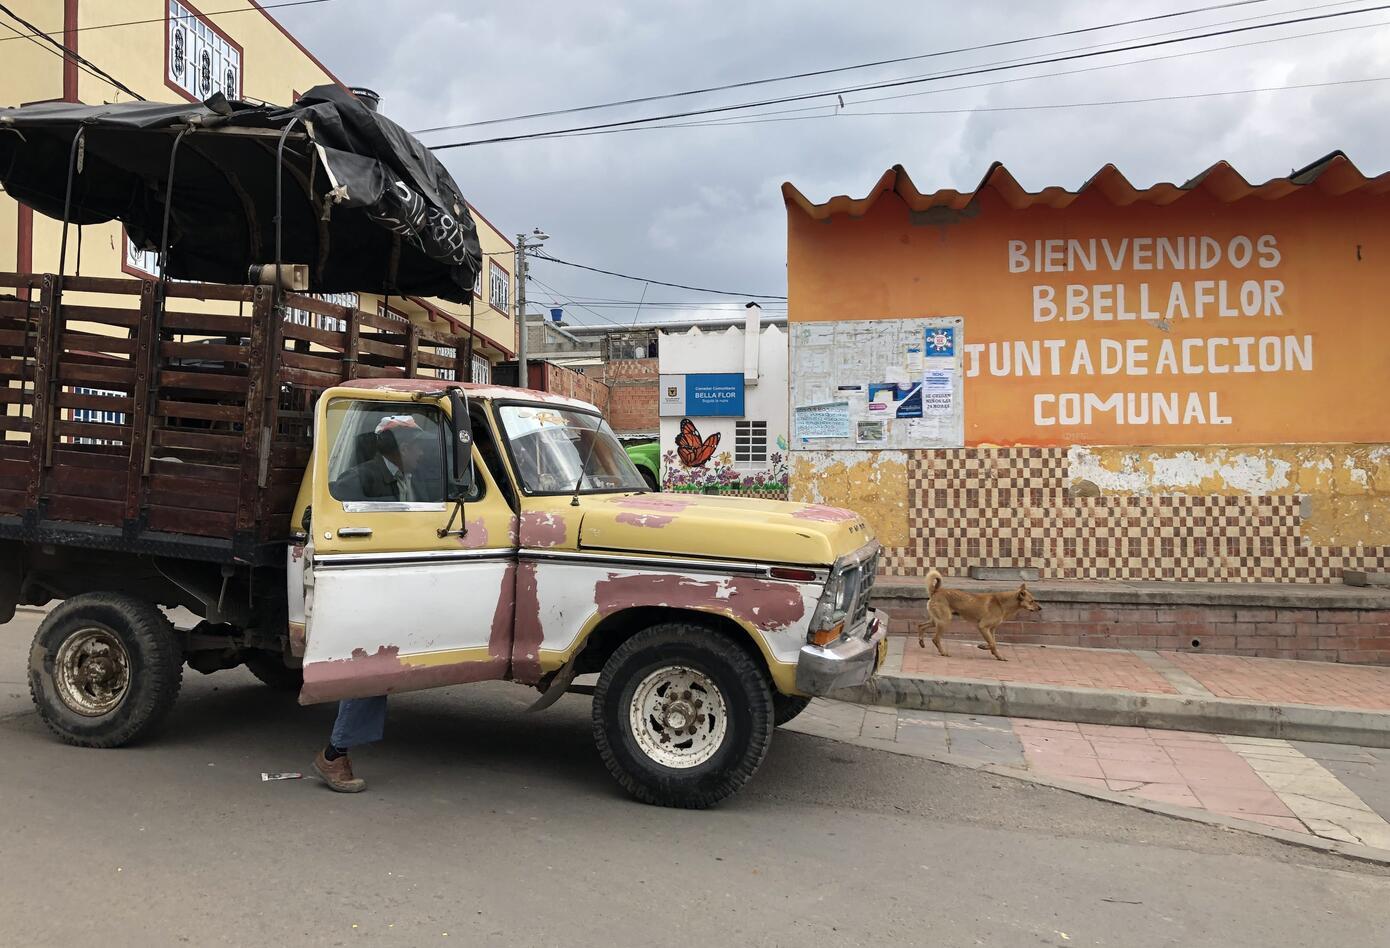 Bella Flor, Ciudad Bolívar